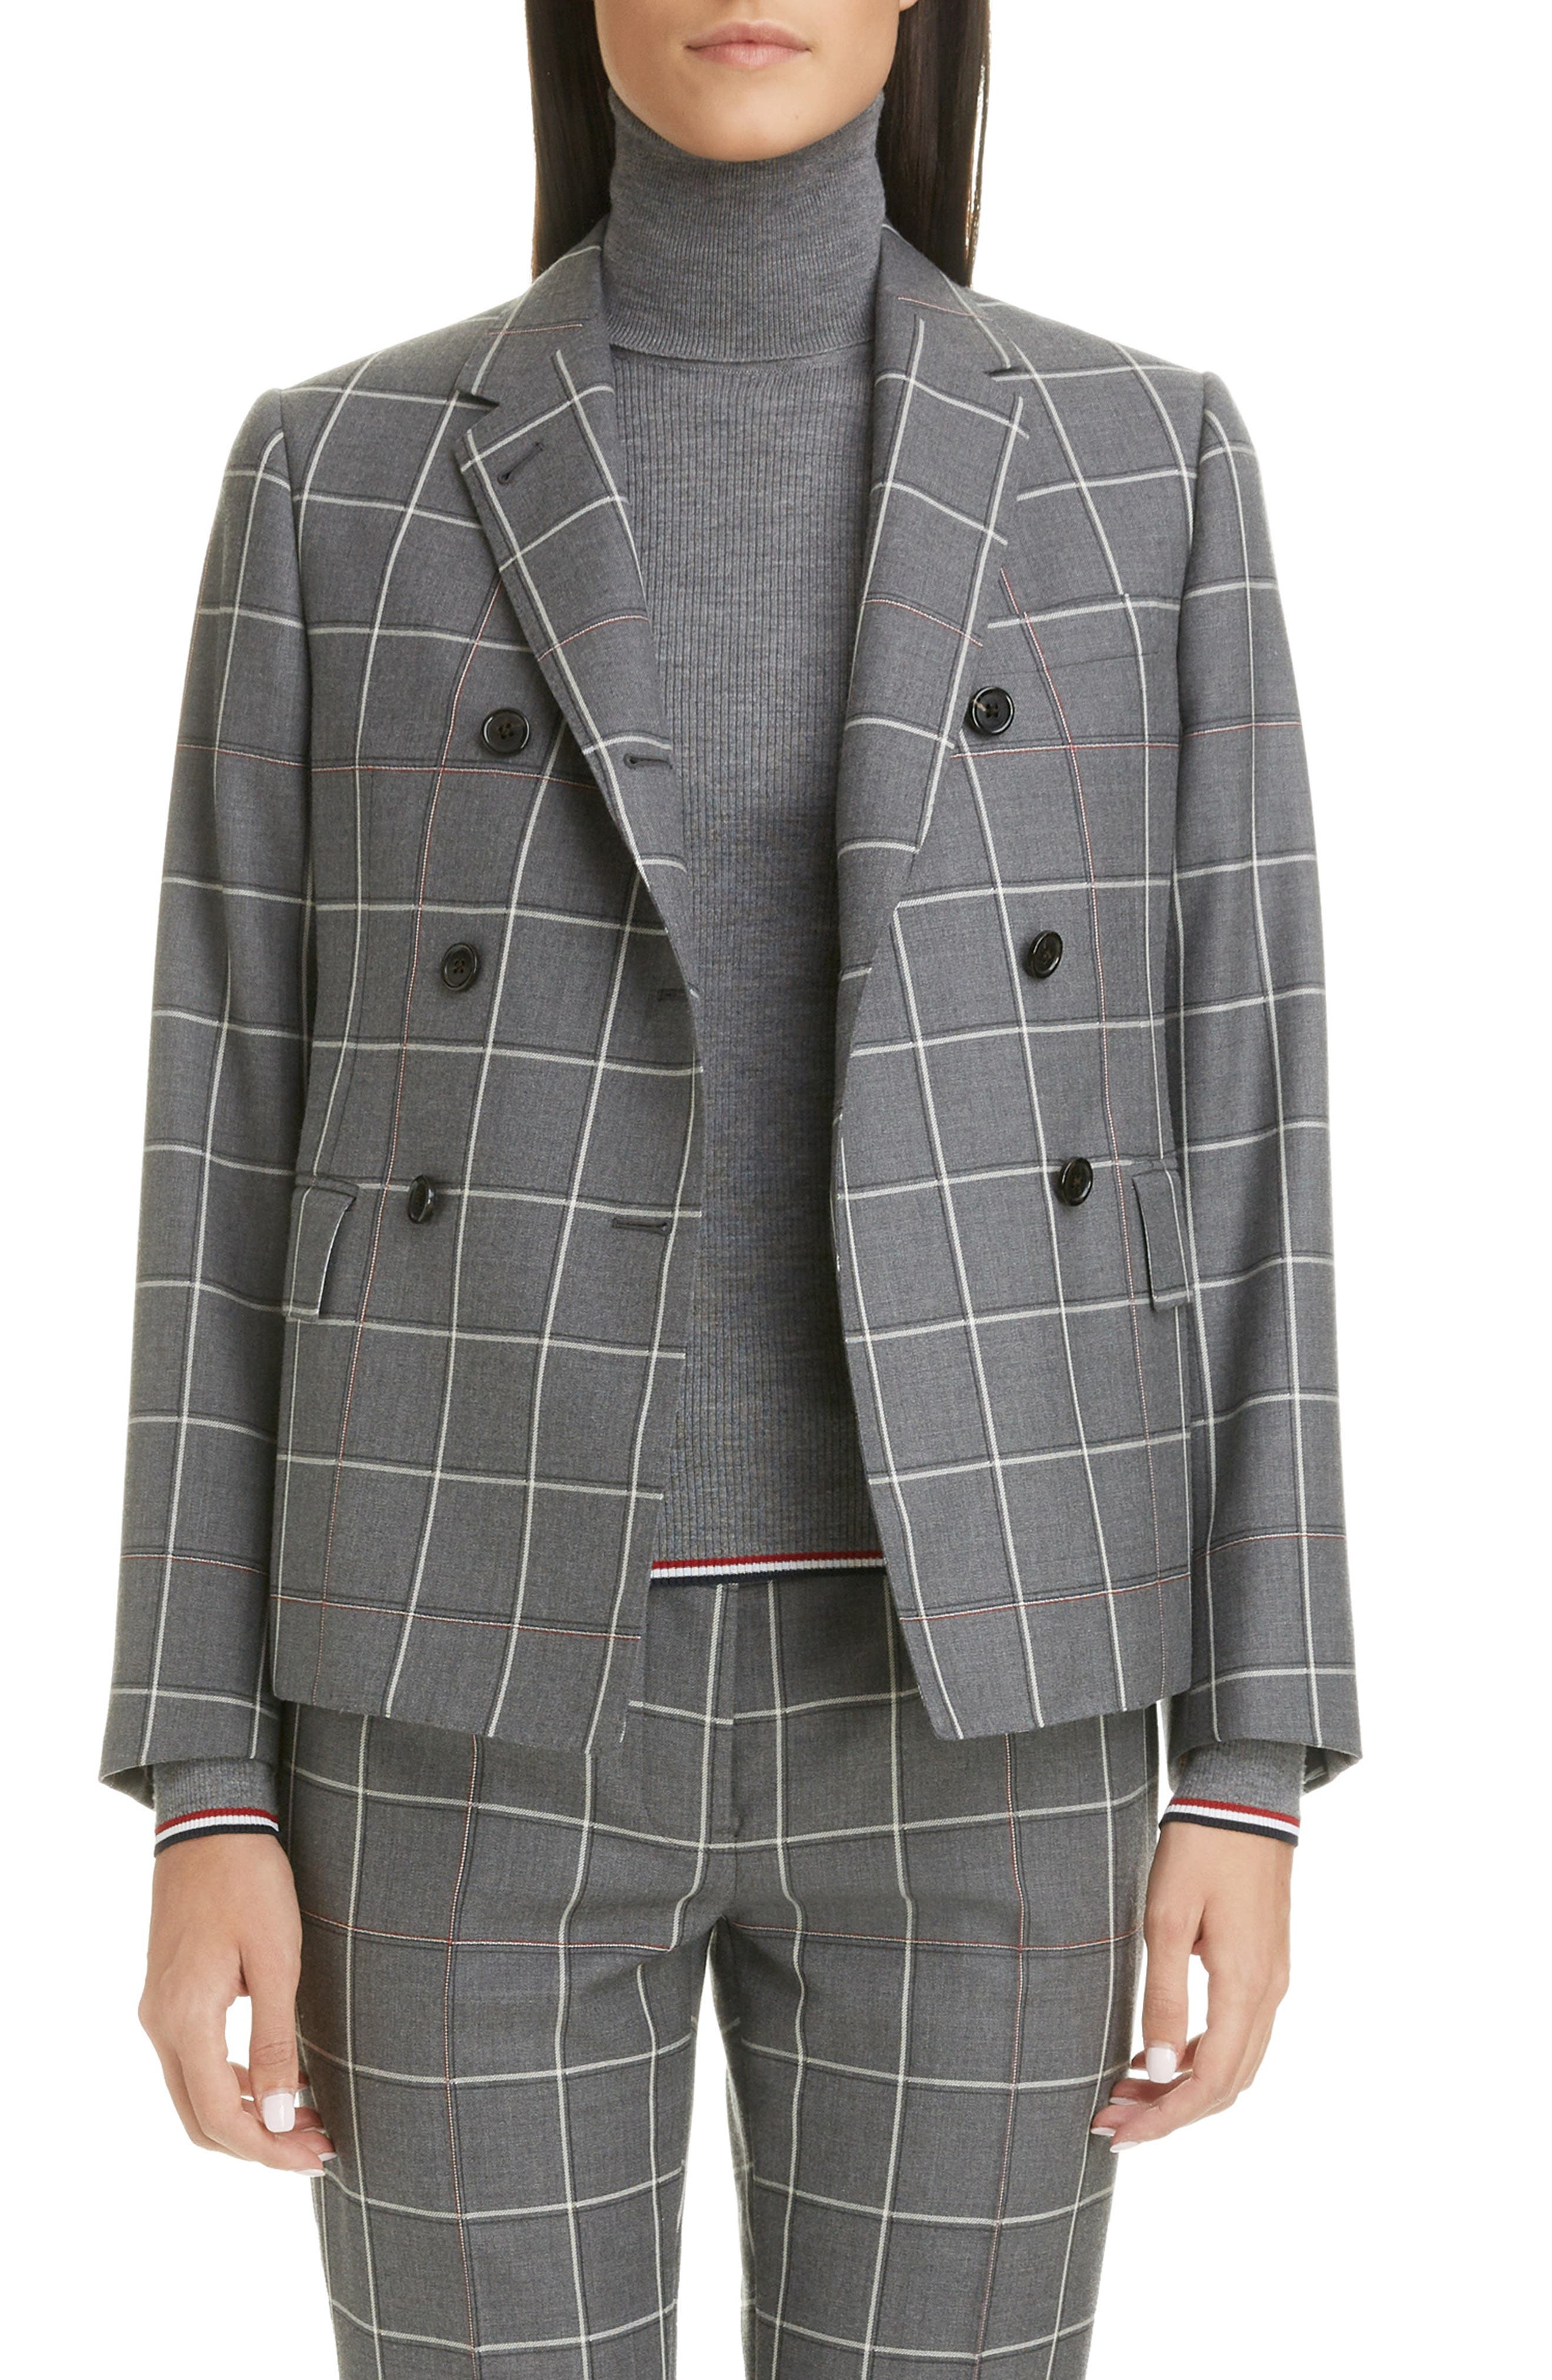 Thom Browne Blazers Double Breasted Wool Blazer